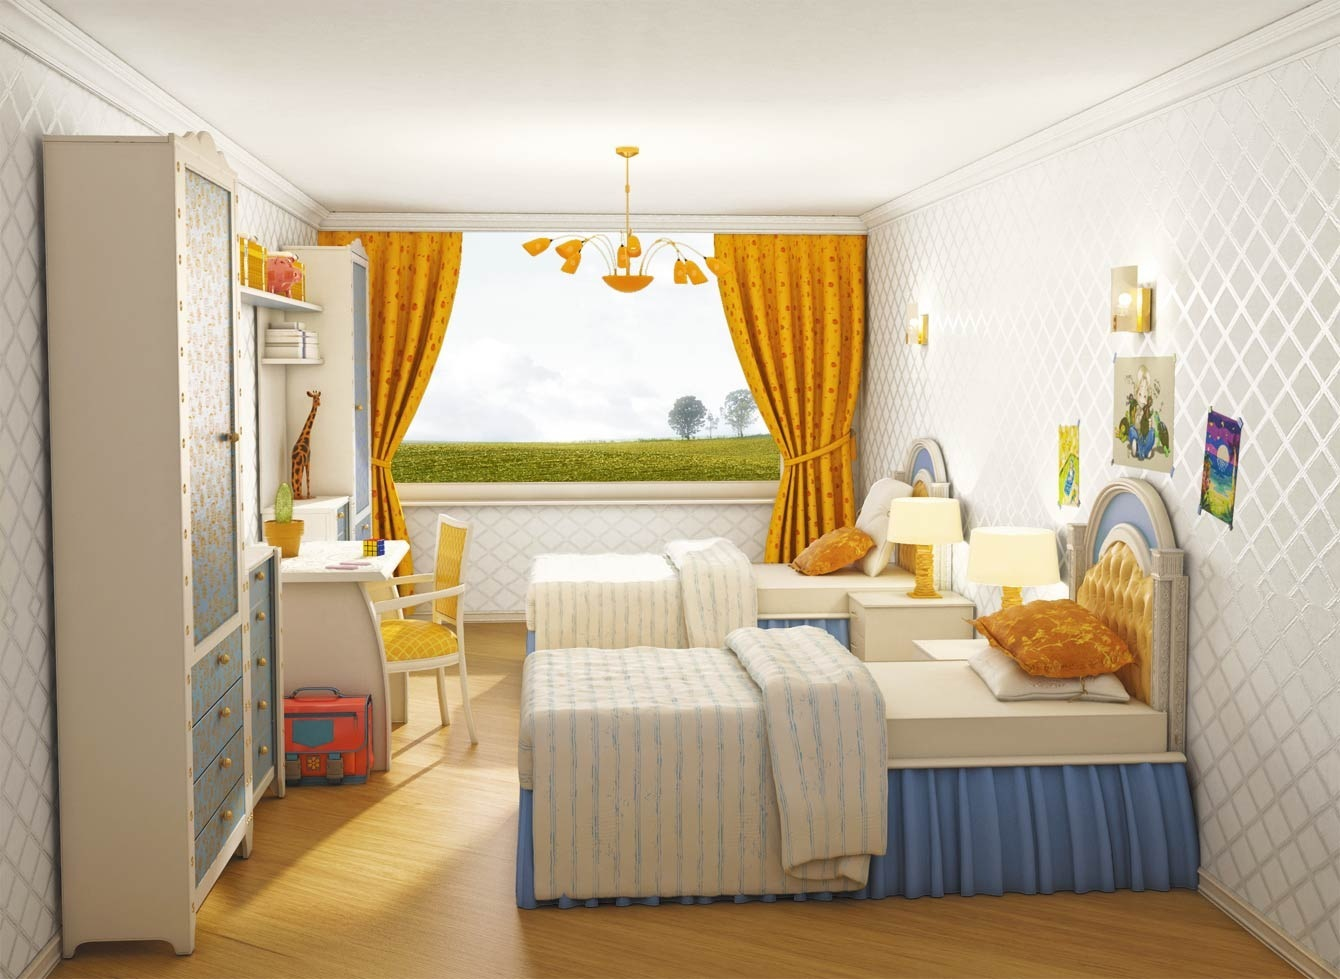 Artistmax design a room for tw 1 1e9b6b69 pwyo